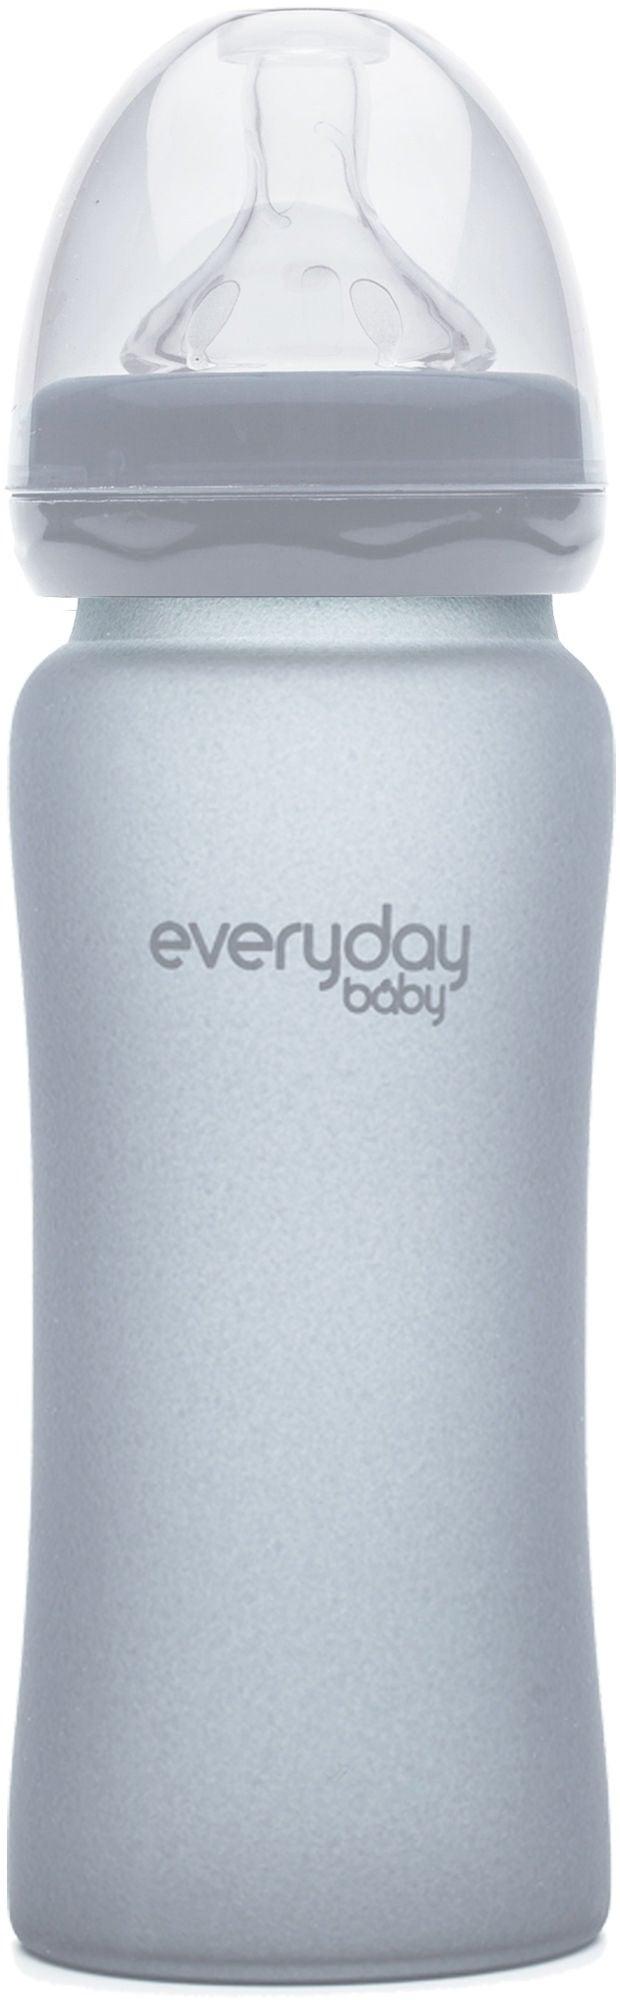 Everyday Baby Nappflaska 300 ml, Quiet Grey